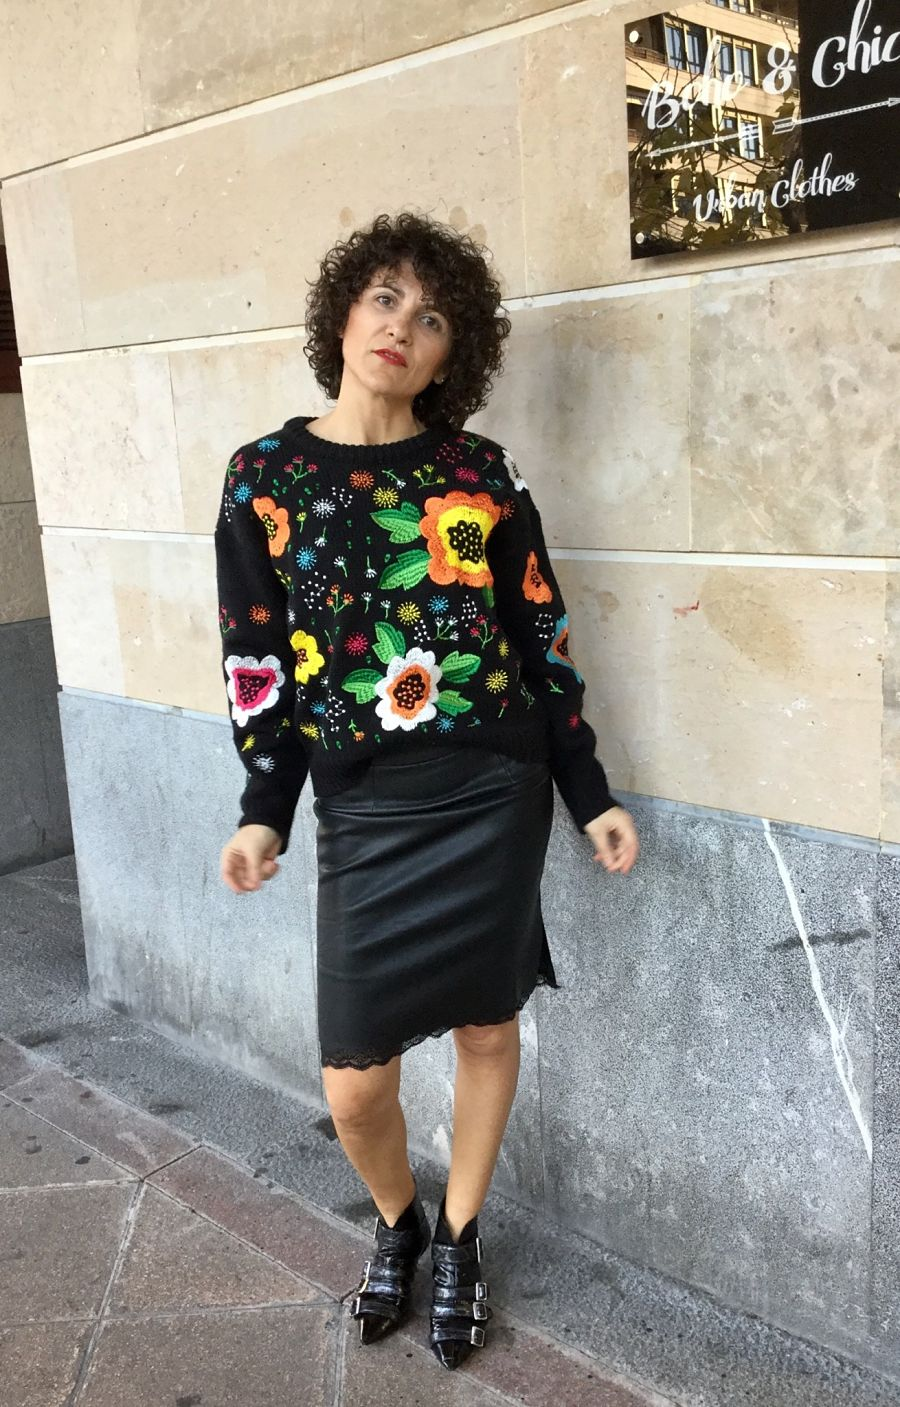 Rebeca Valdivia, asesora de imagen, asesora eventos, personal shopper, estilista, stilist, Donostia, San Sebastián, Miss Clov, tienda de ropa, clothes shop, boho & chic, boho style, accesorios, jersey flores, flowers sweater